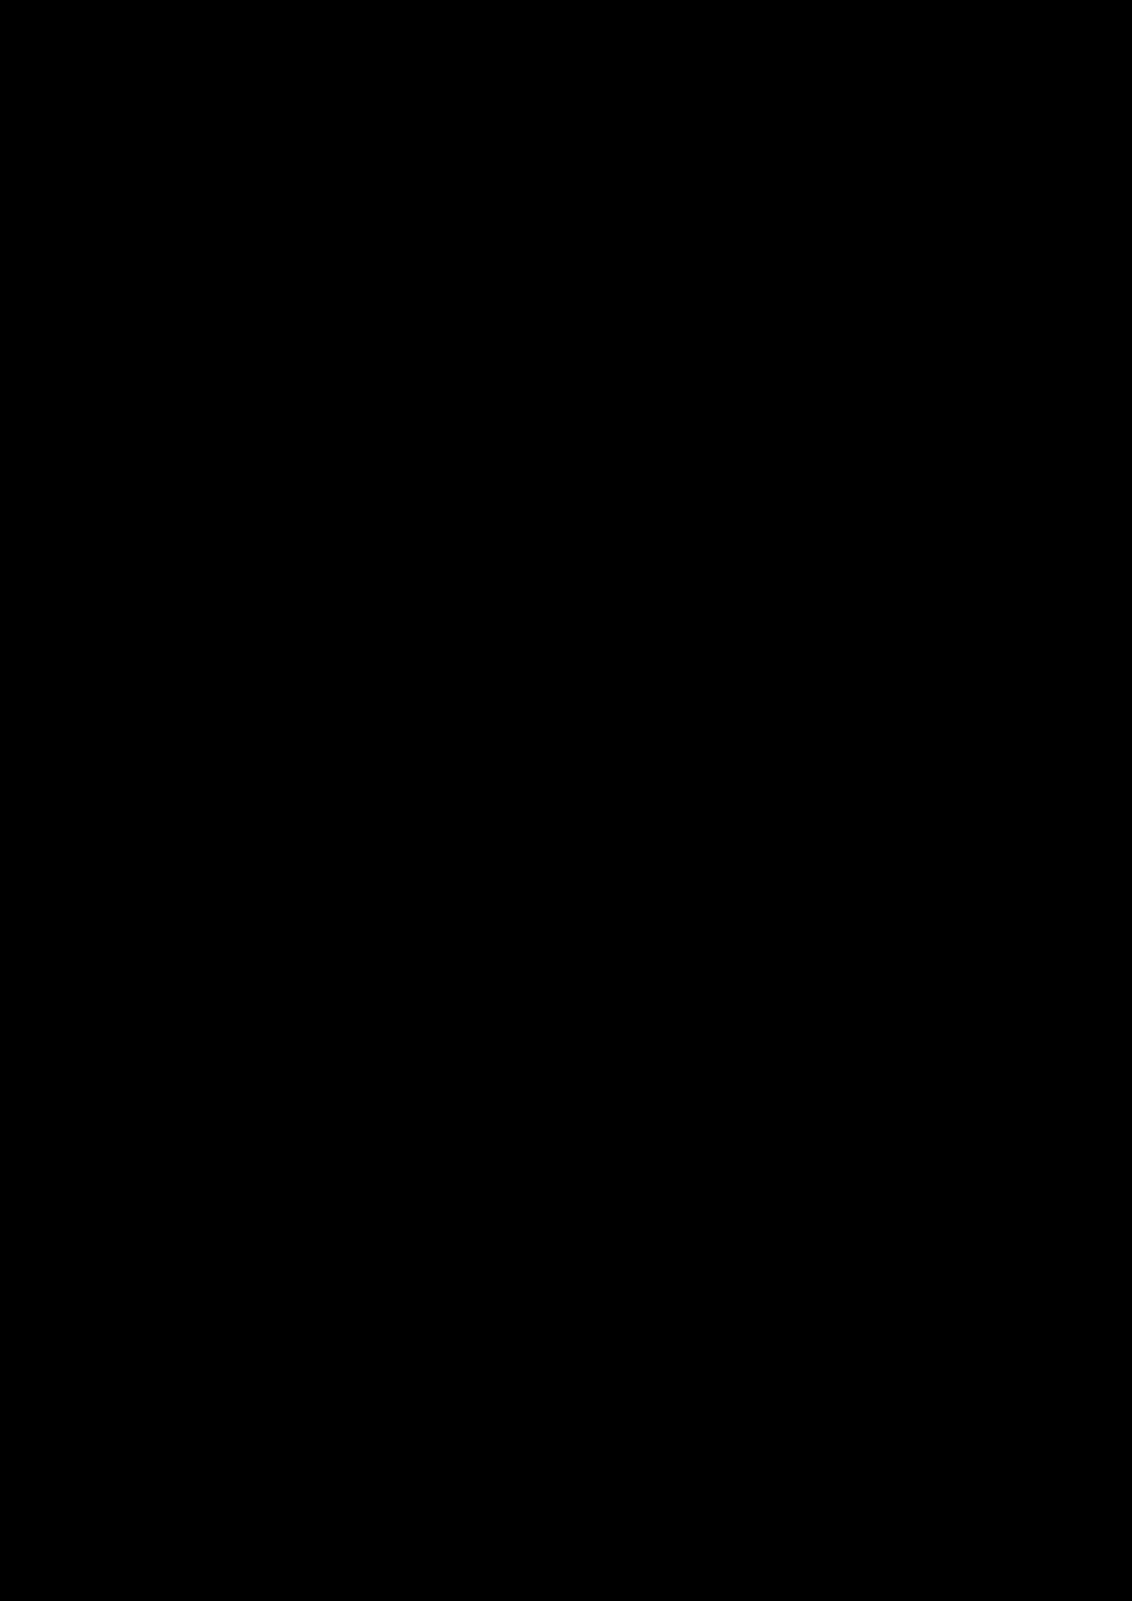 Ispoved Pervogo Boga slide, Image 57